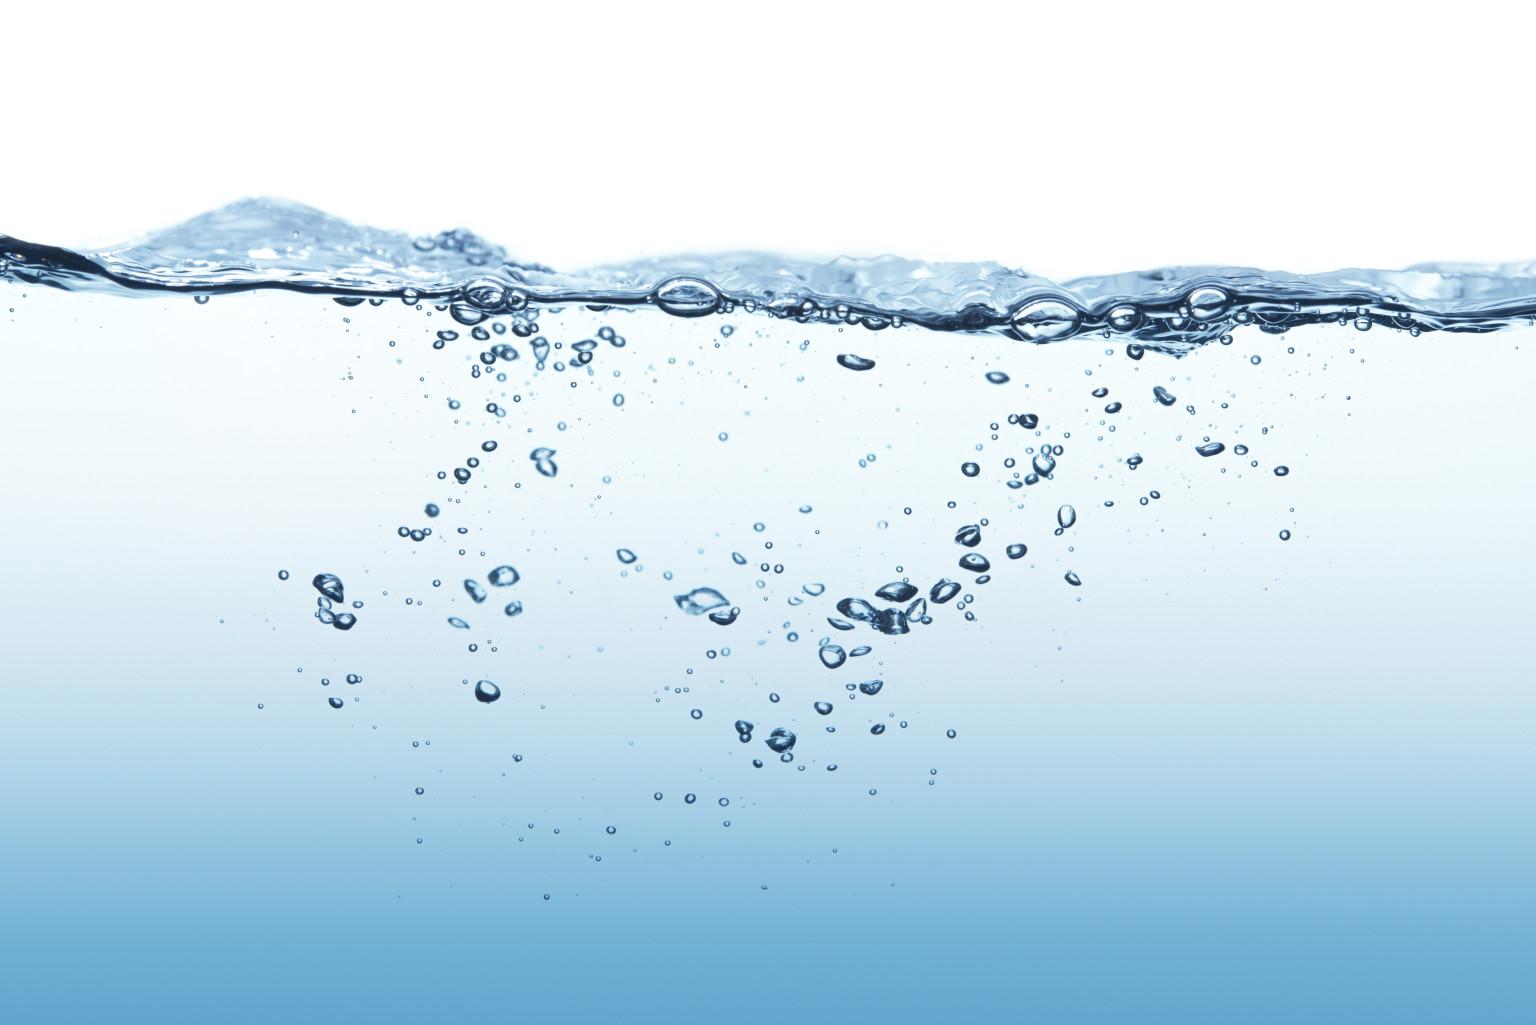 water-1cemv73